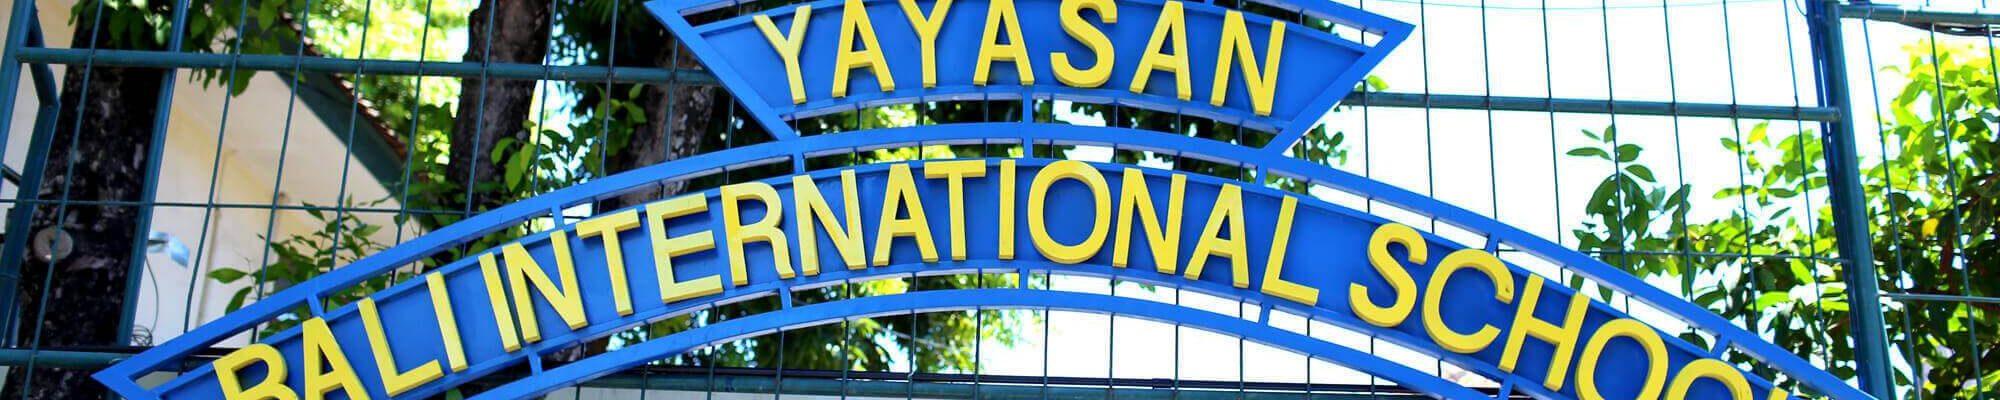 yayasan_bali_international_school